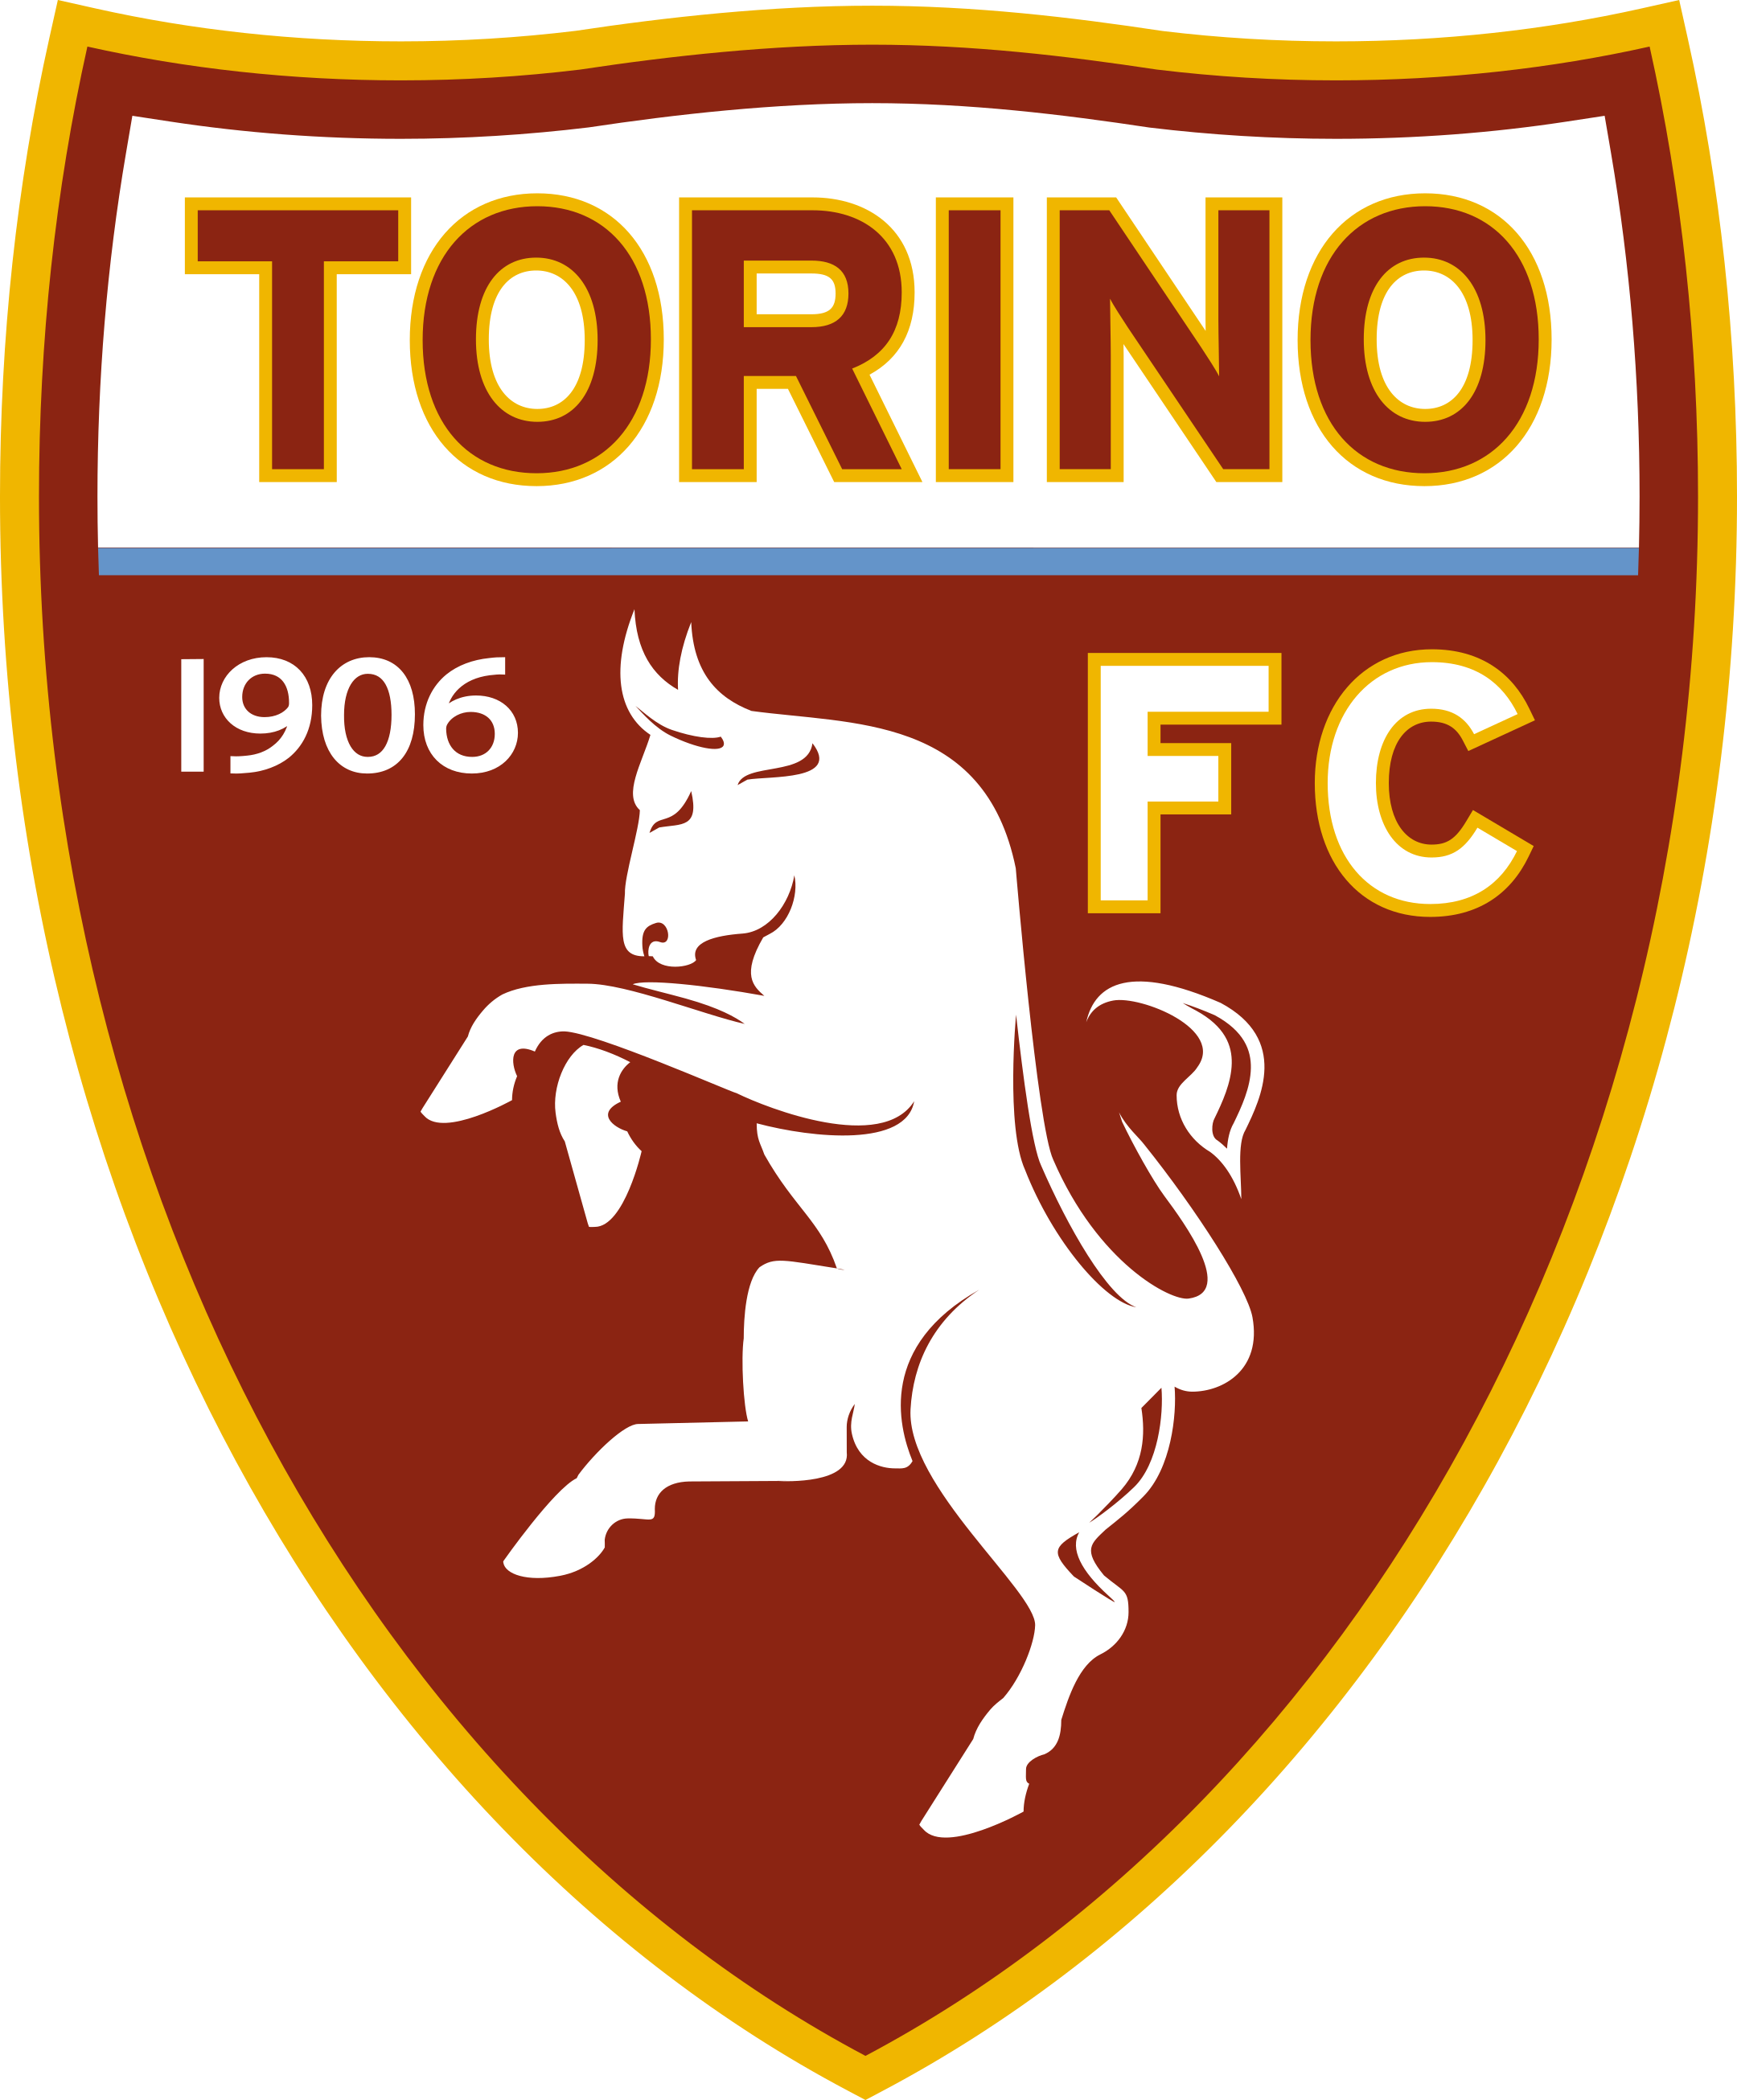 torino fc logo 1 - Torino FC Logo